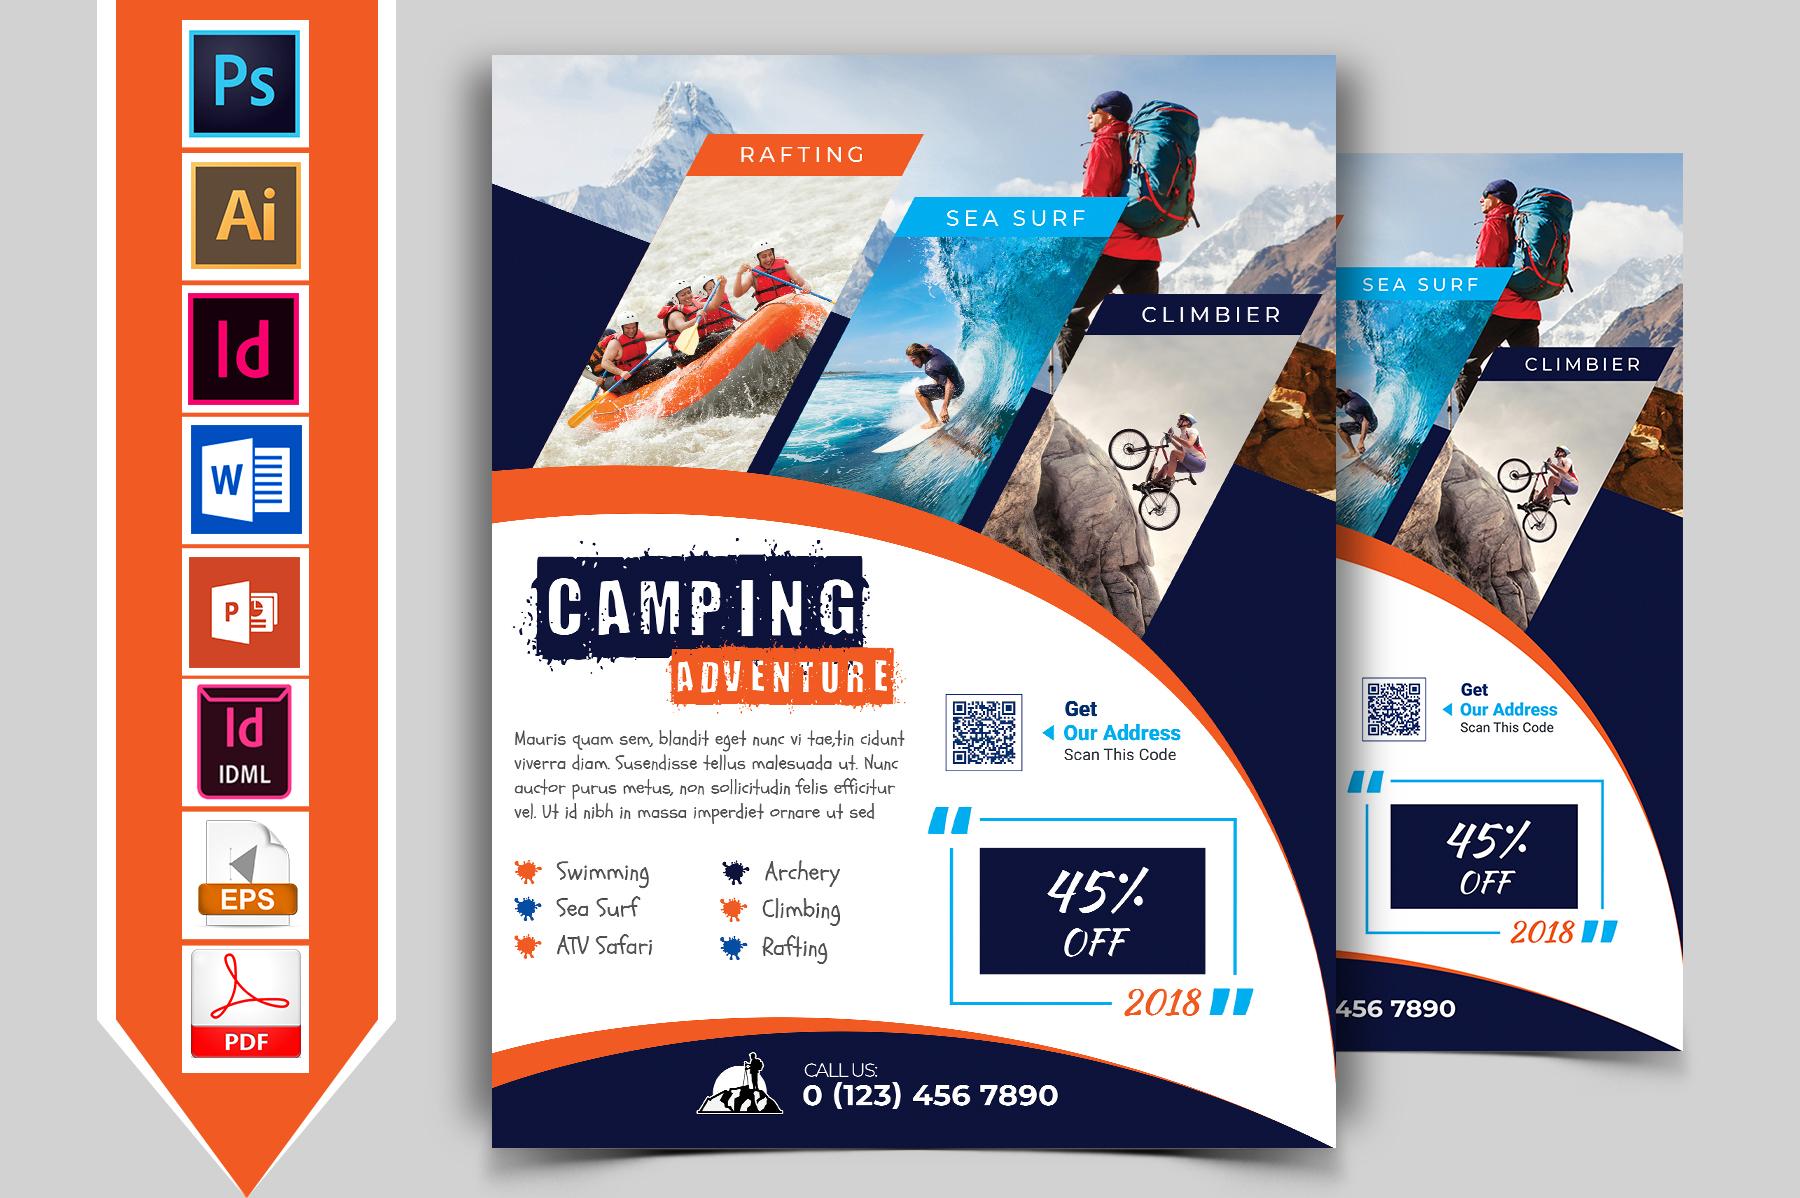 Camping Adventure Flyer Vol-03 example image 1